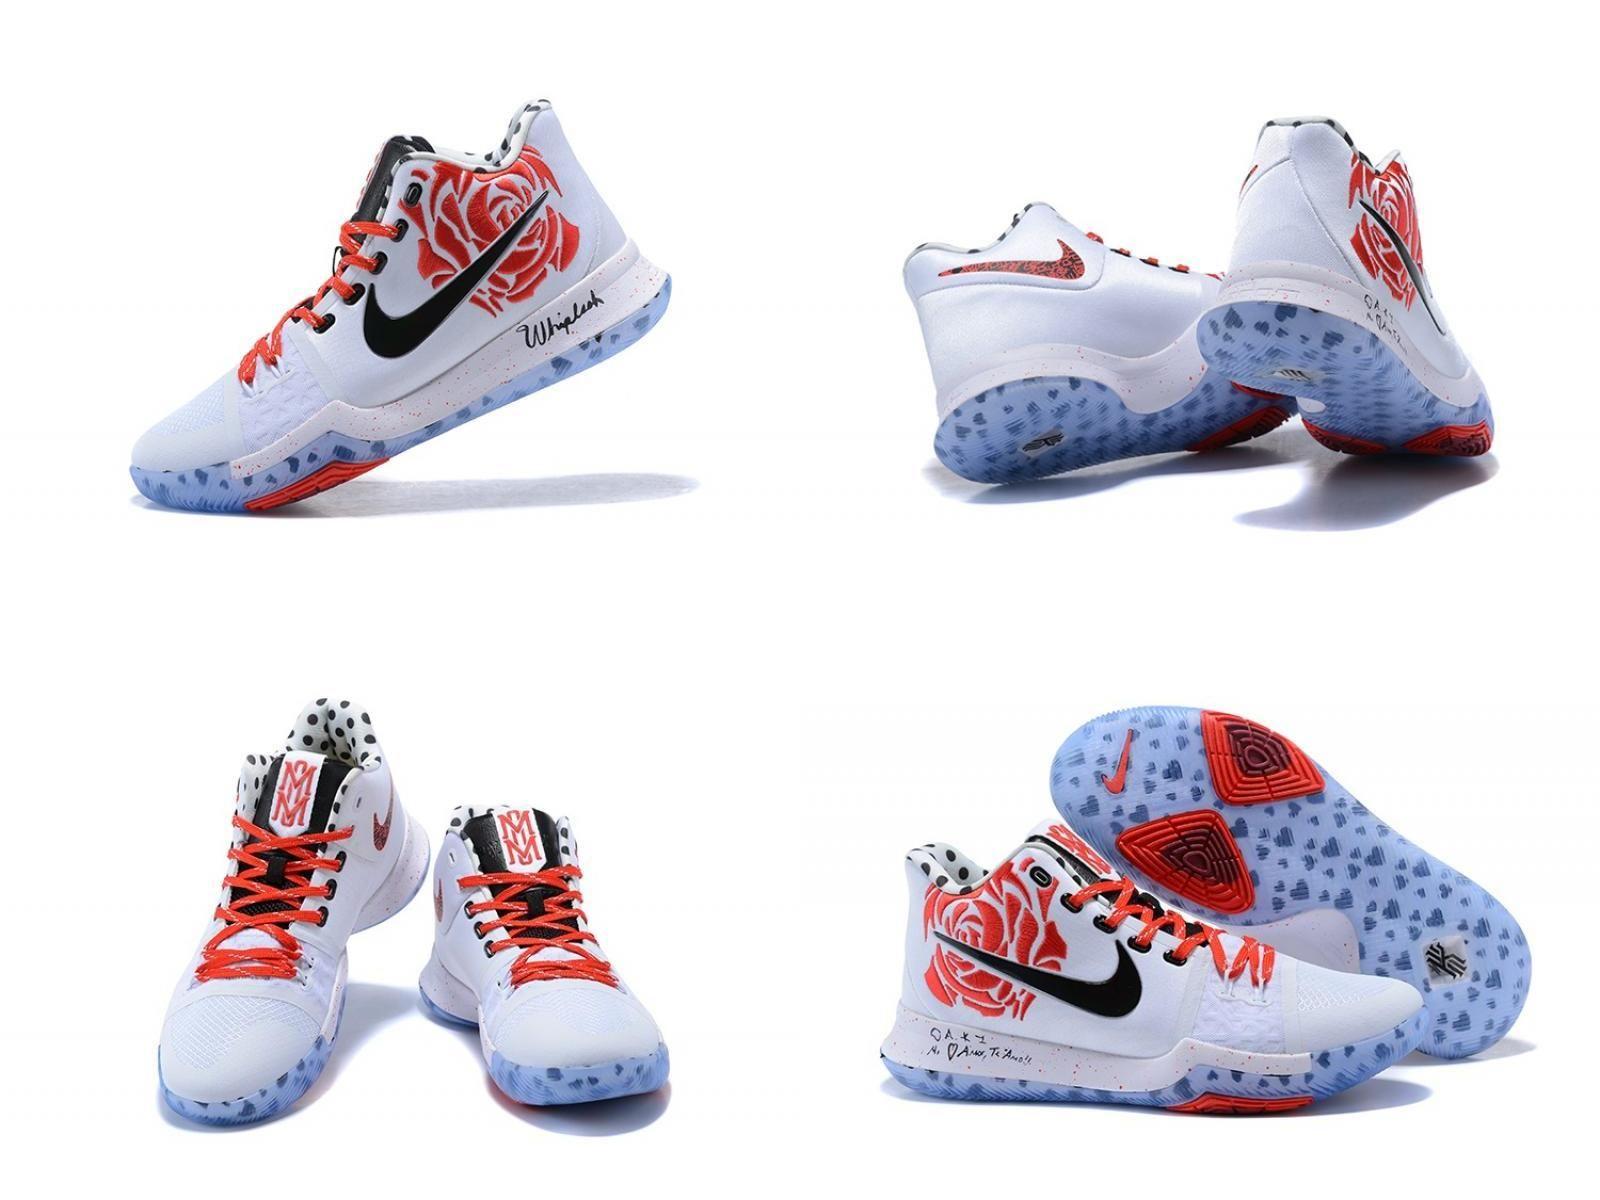 limited Sneaker Room x Nike Kyrie 3